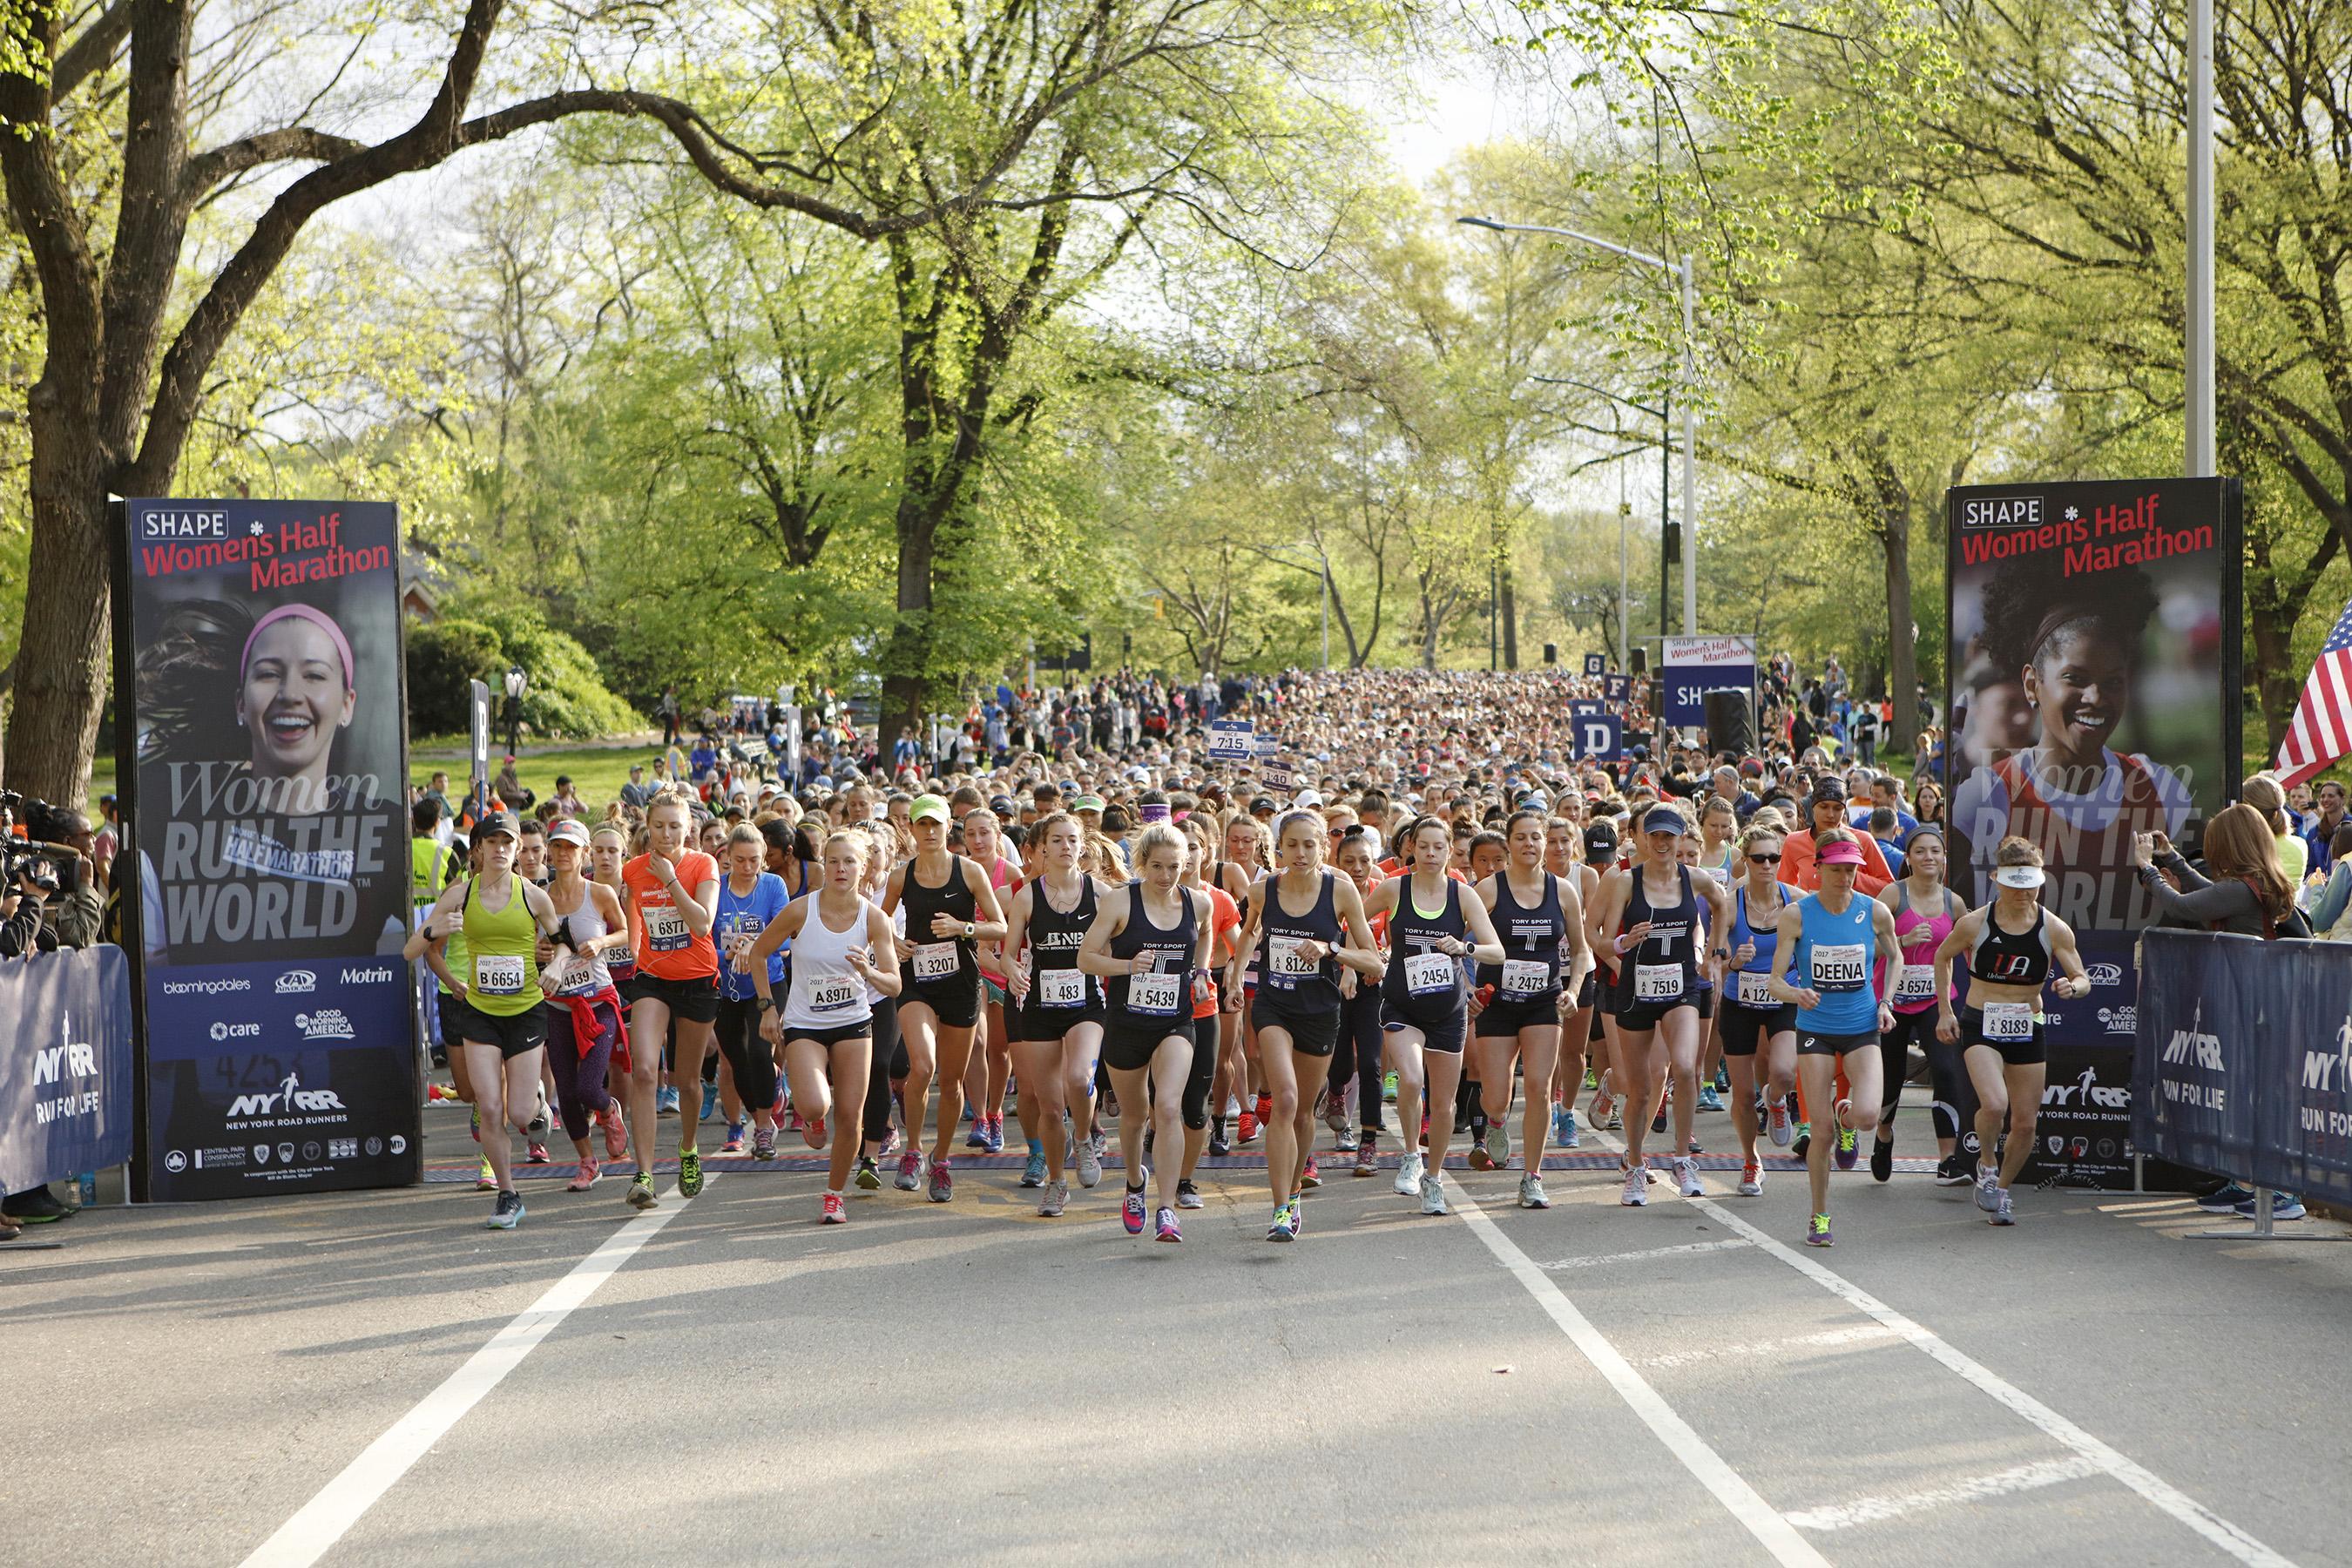 2017 SHAPE Women's Half-Marathon Draws Thousands Of Women From Around The World